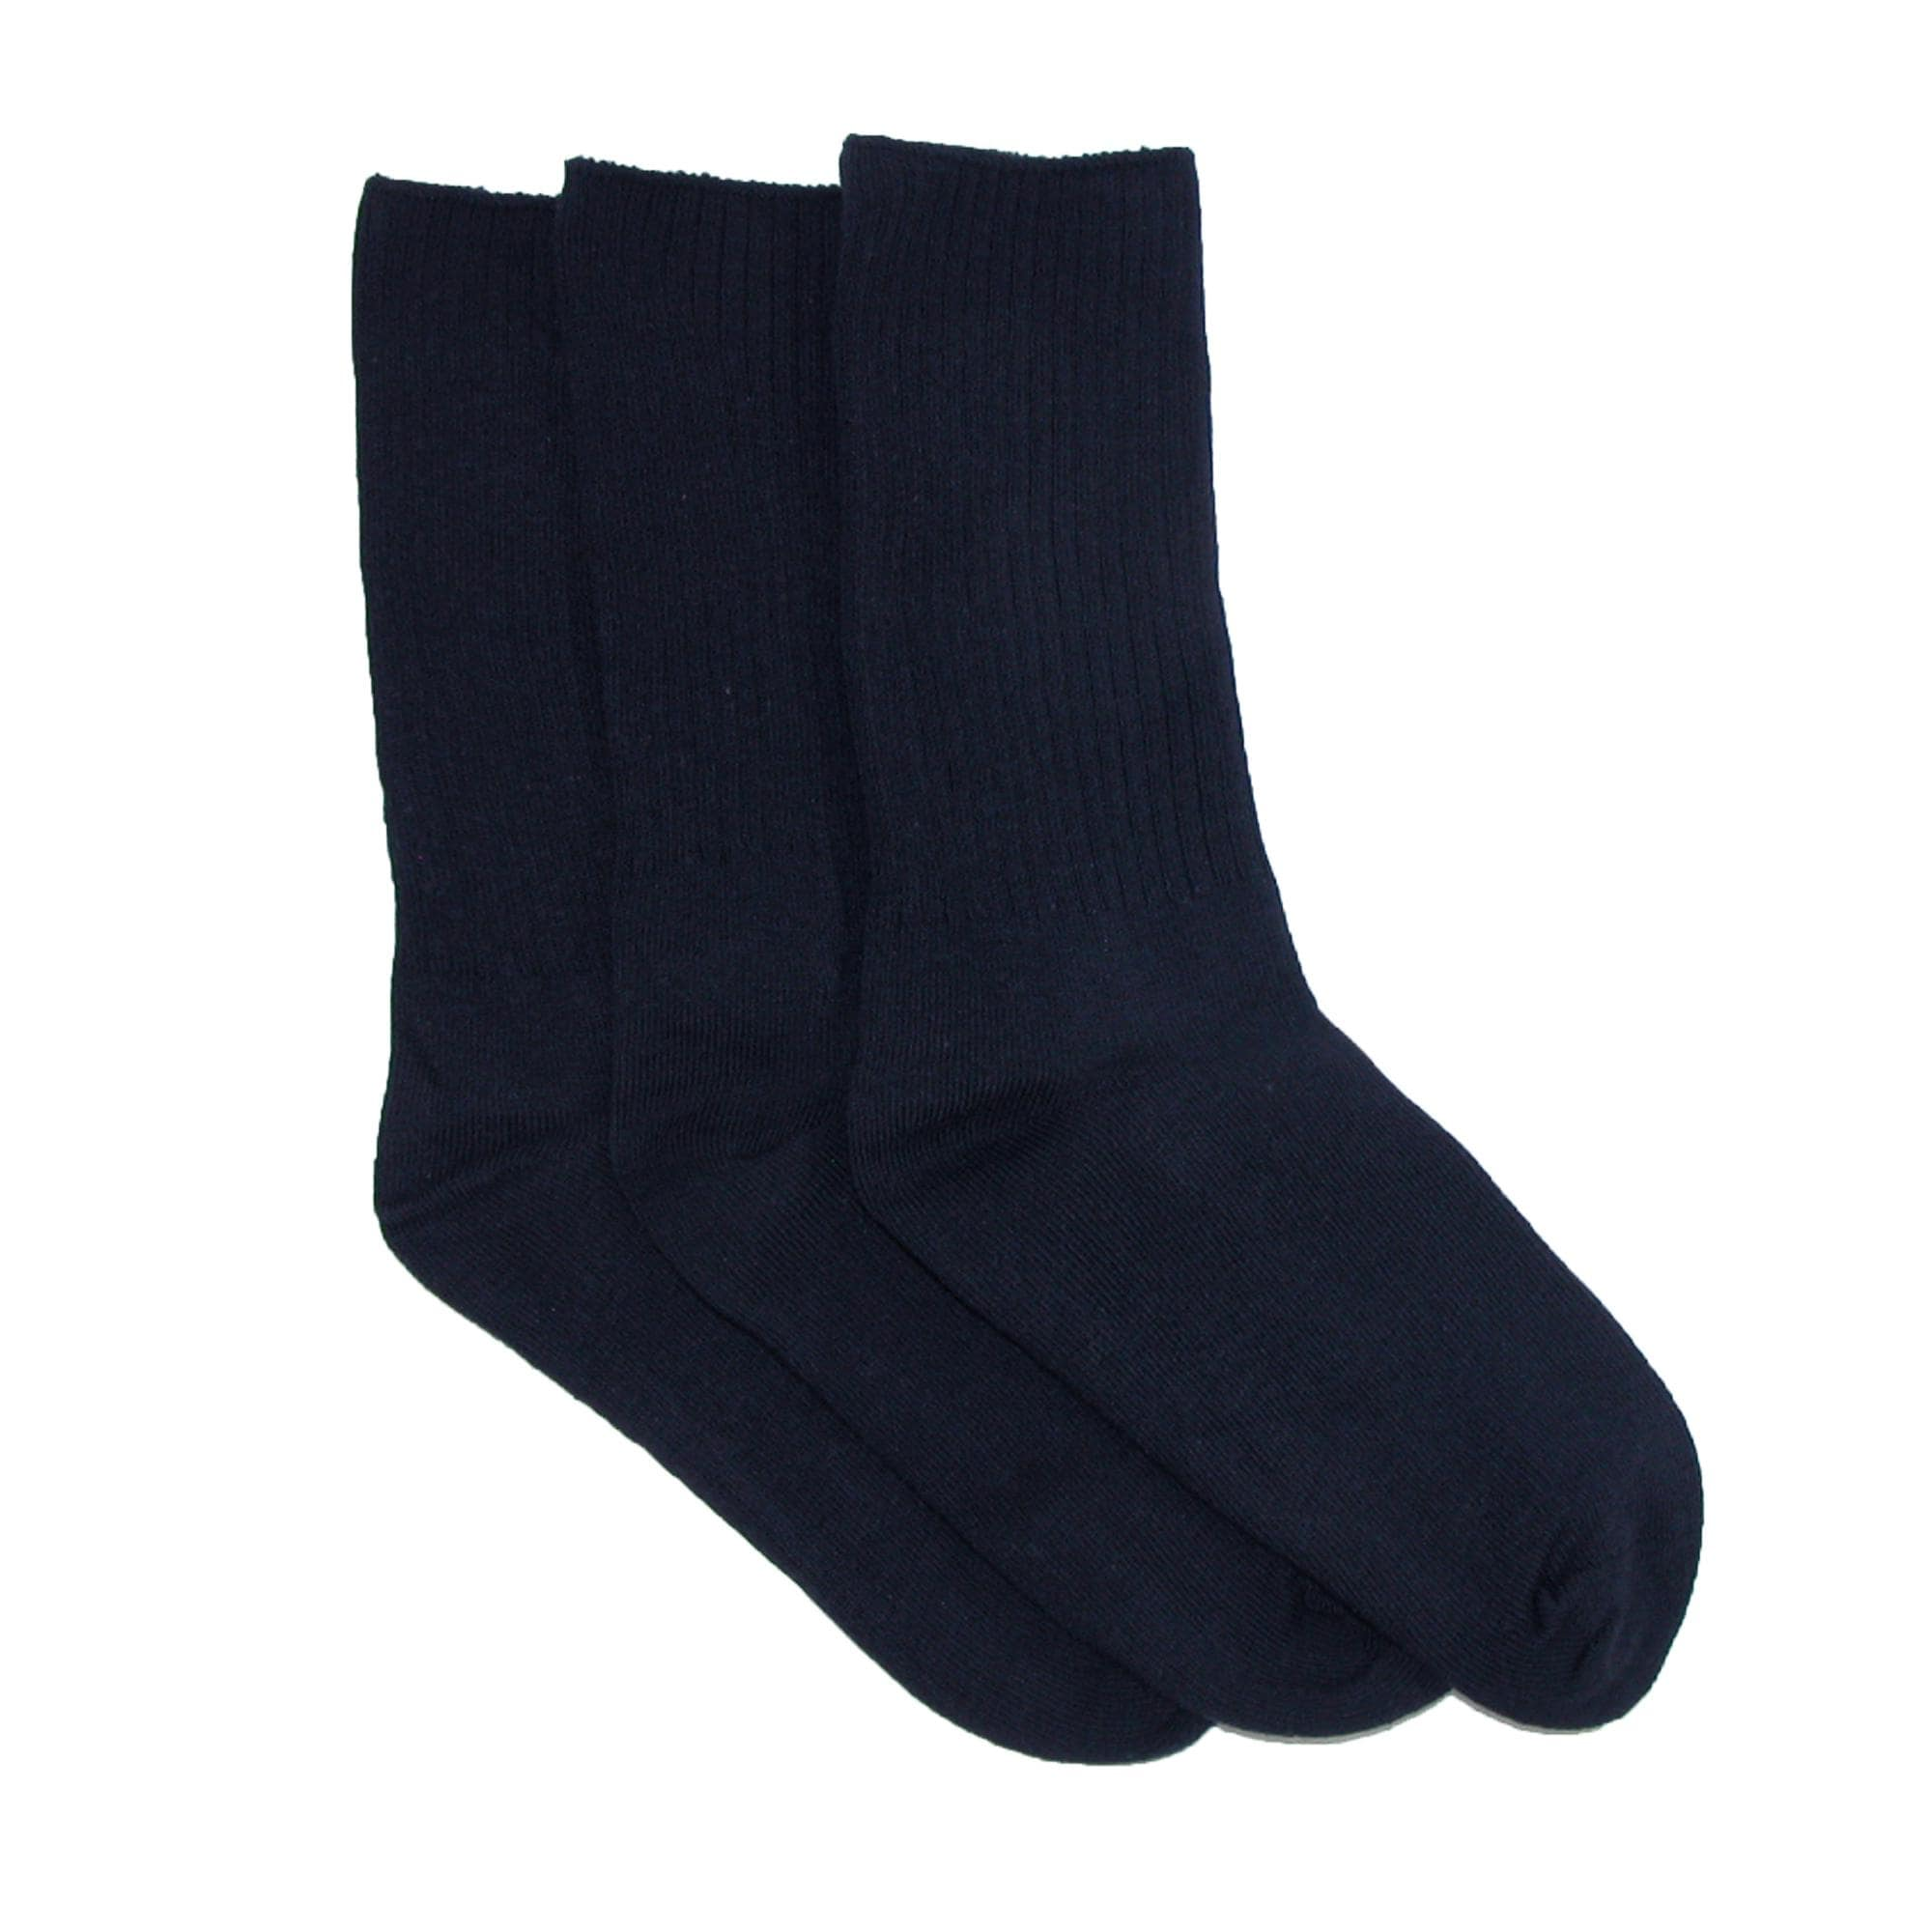 Jefferies Socks Girls Casual Cotton Multi Pack Crew School Dress Socks 3 Pair Pack